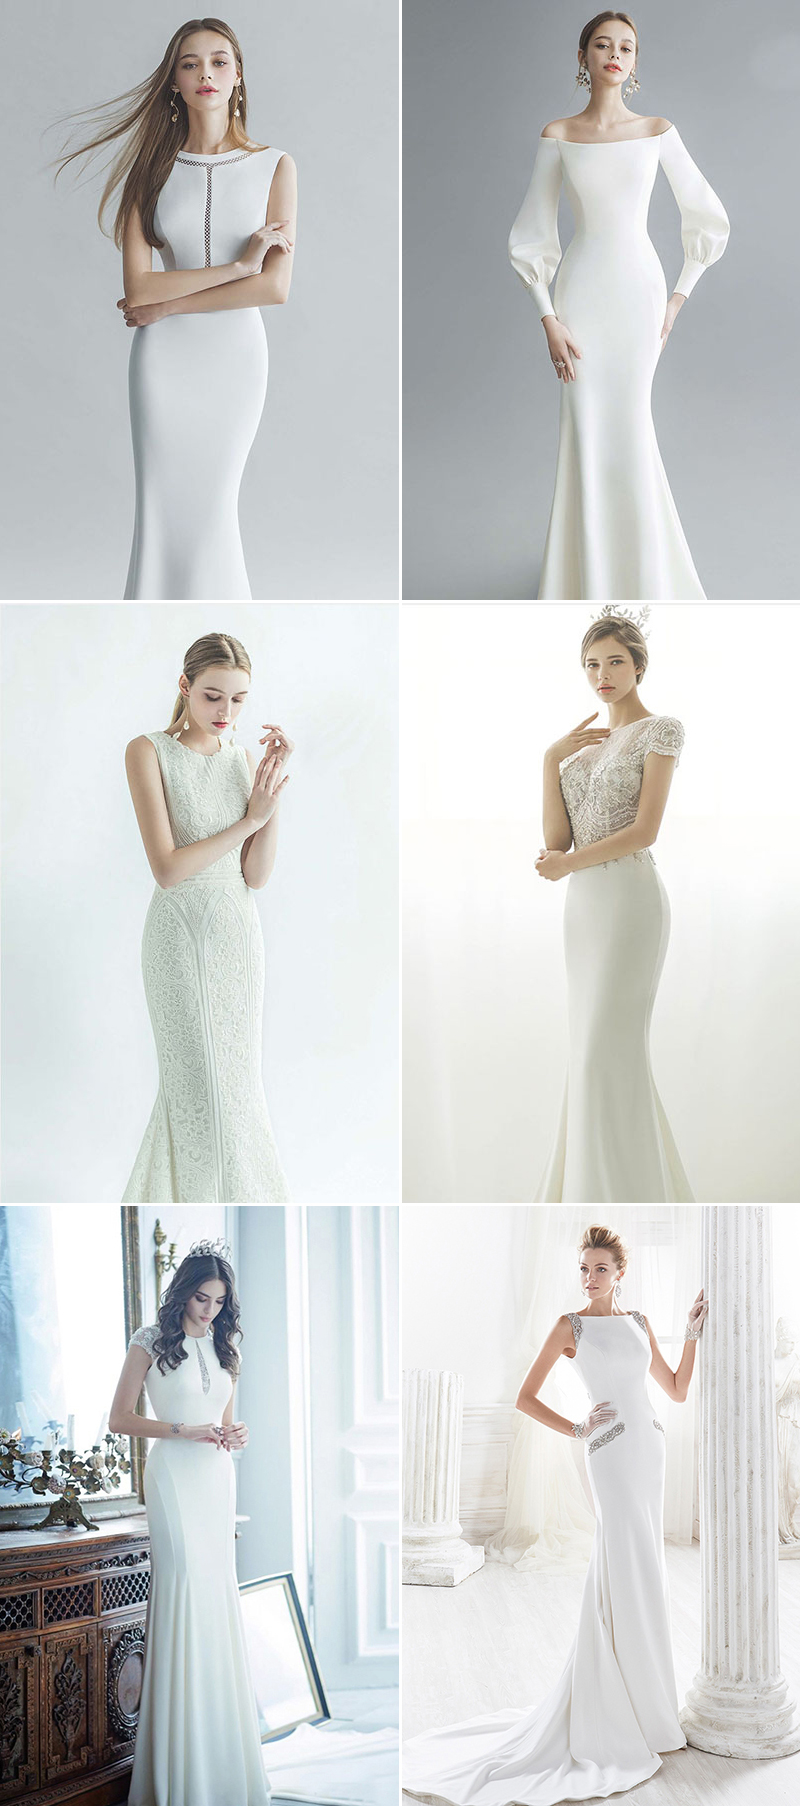 Wedding Dresses with Jewel or Bateau Neckline